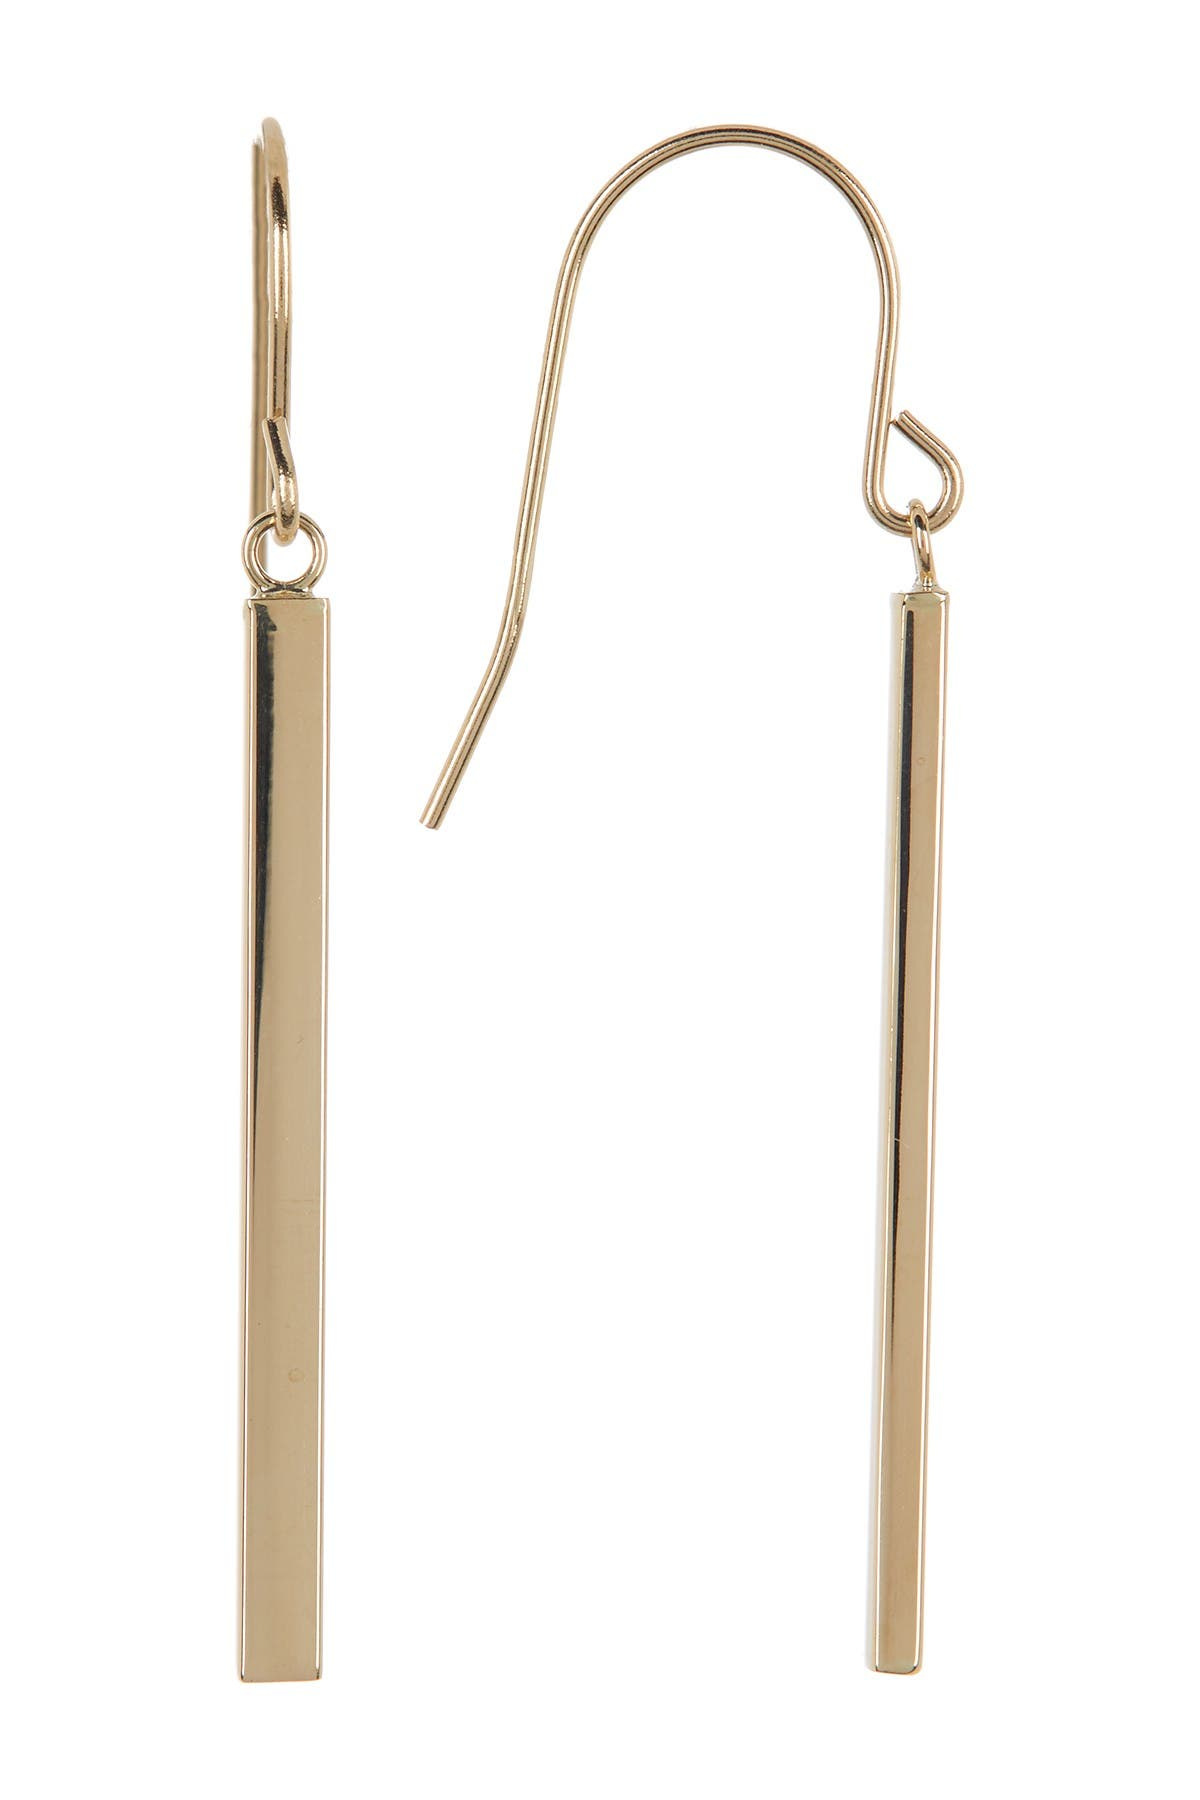 Image of Candela 14K Yellow Gold Dangling Bar Earrings